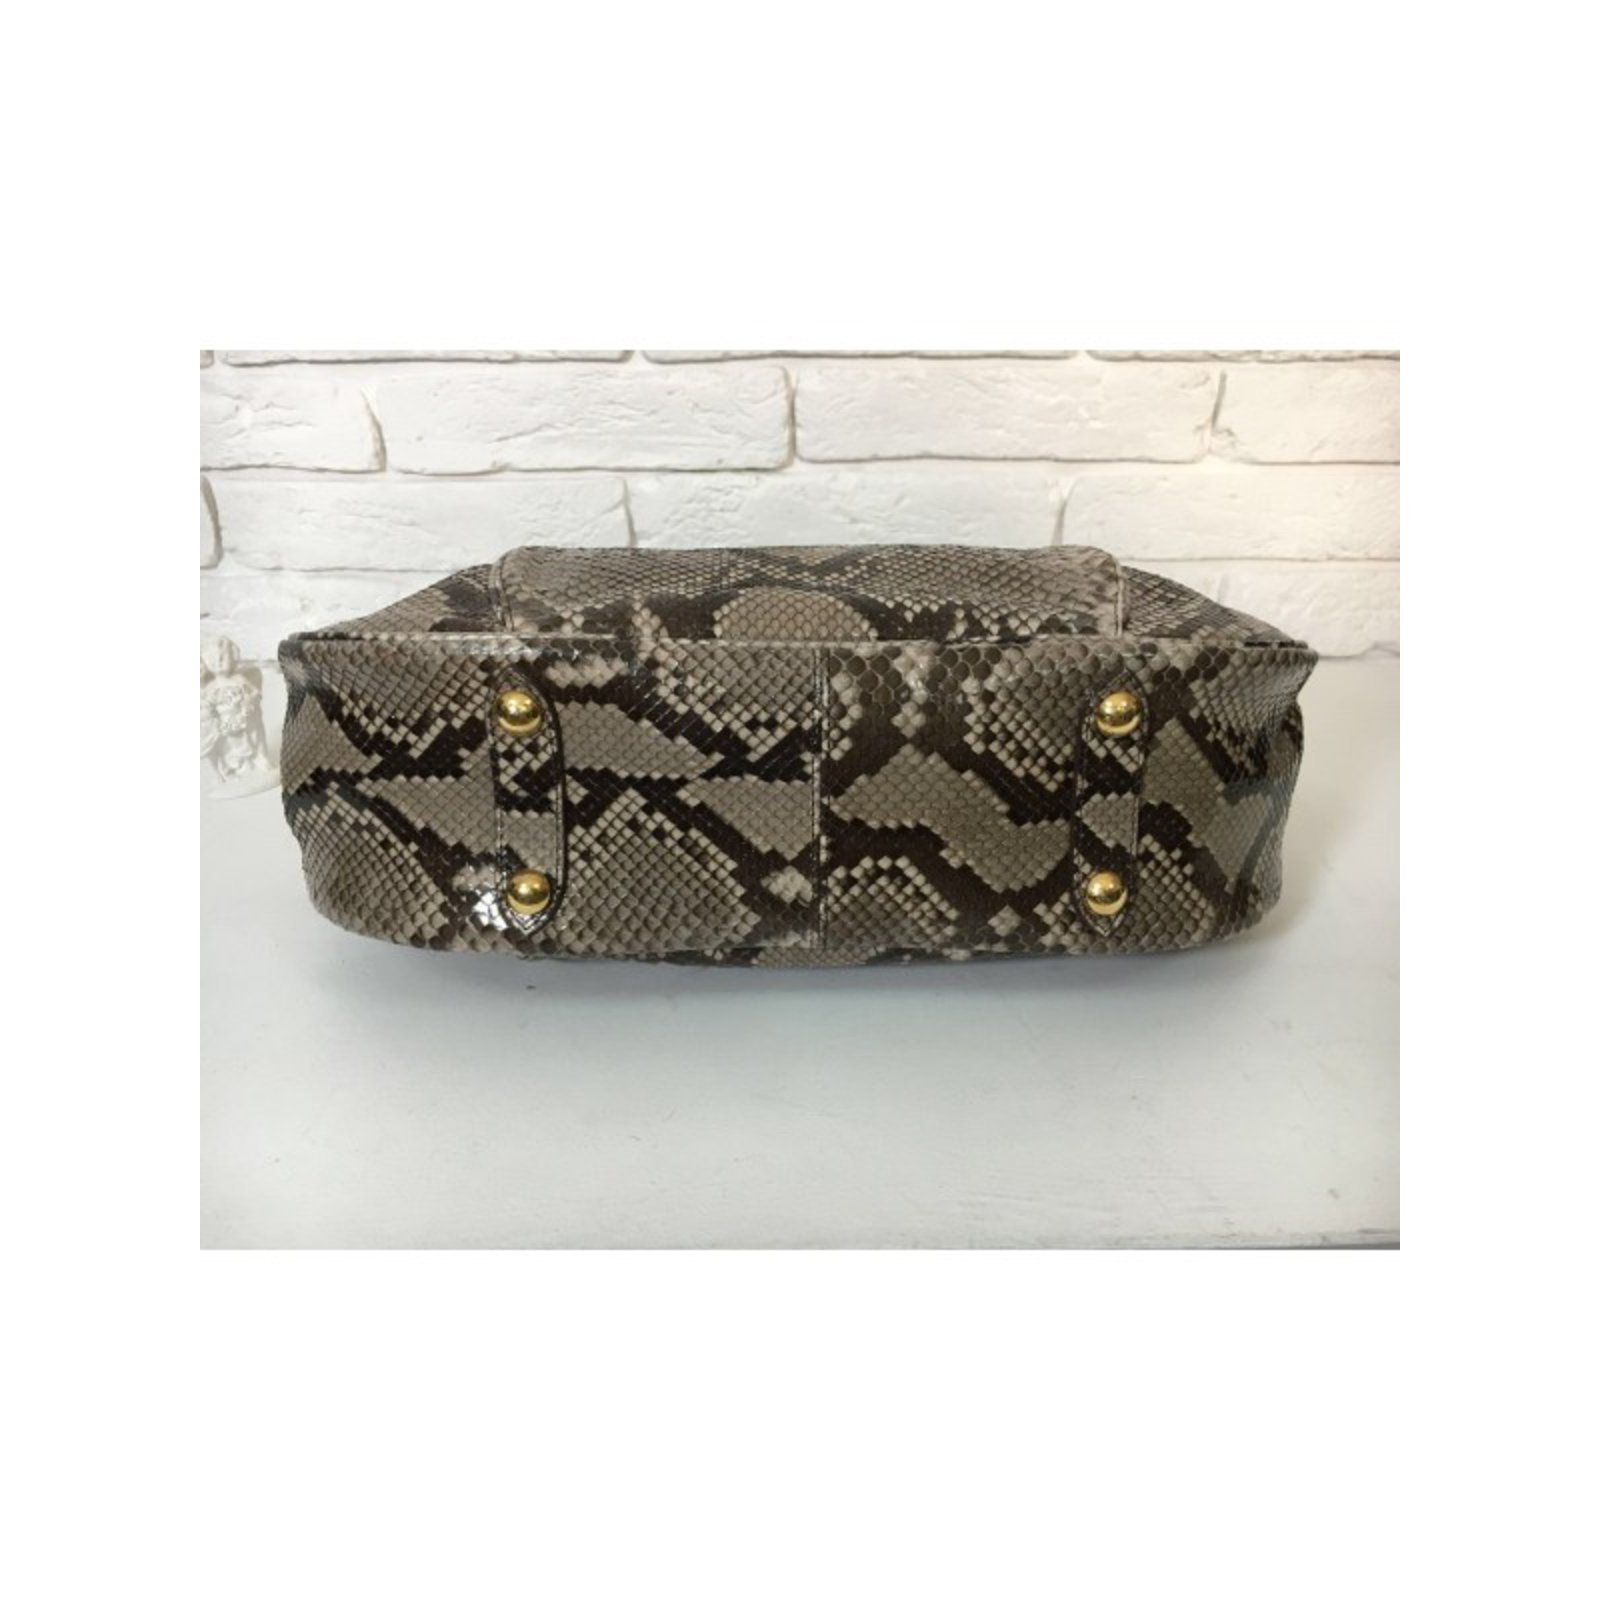 b97818e433c0 Facebook · Pin This. Louis Vuitton Limited Edition Python Galliera Smeralda  ...